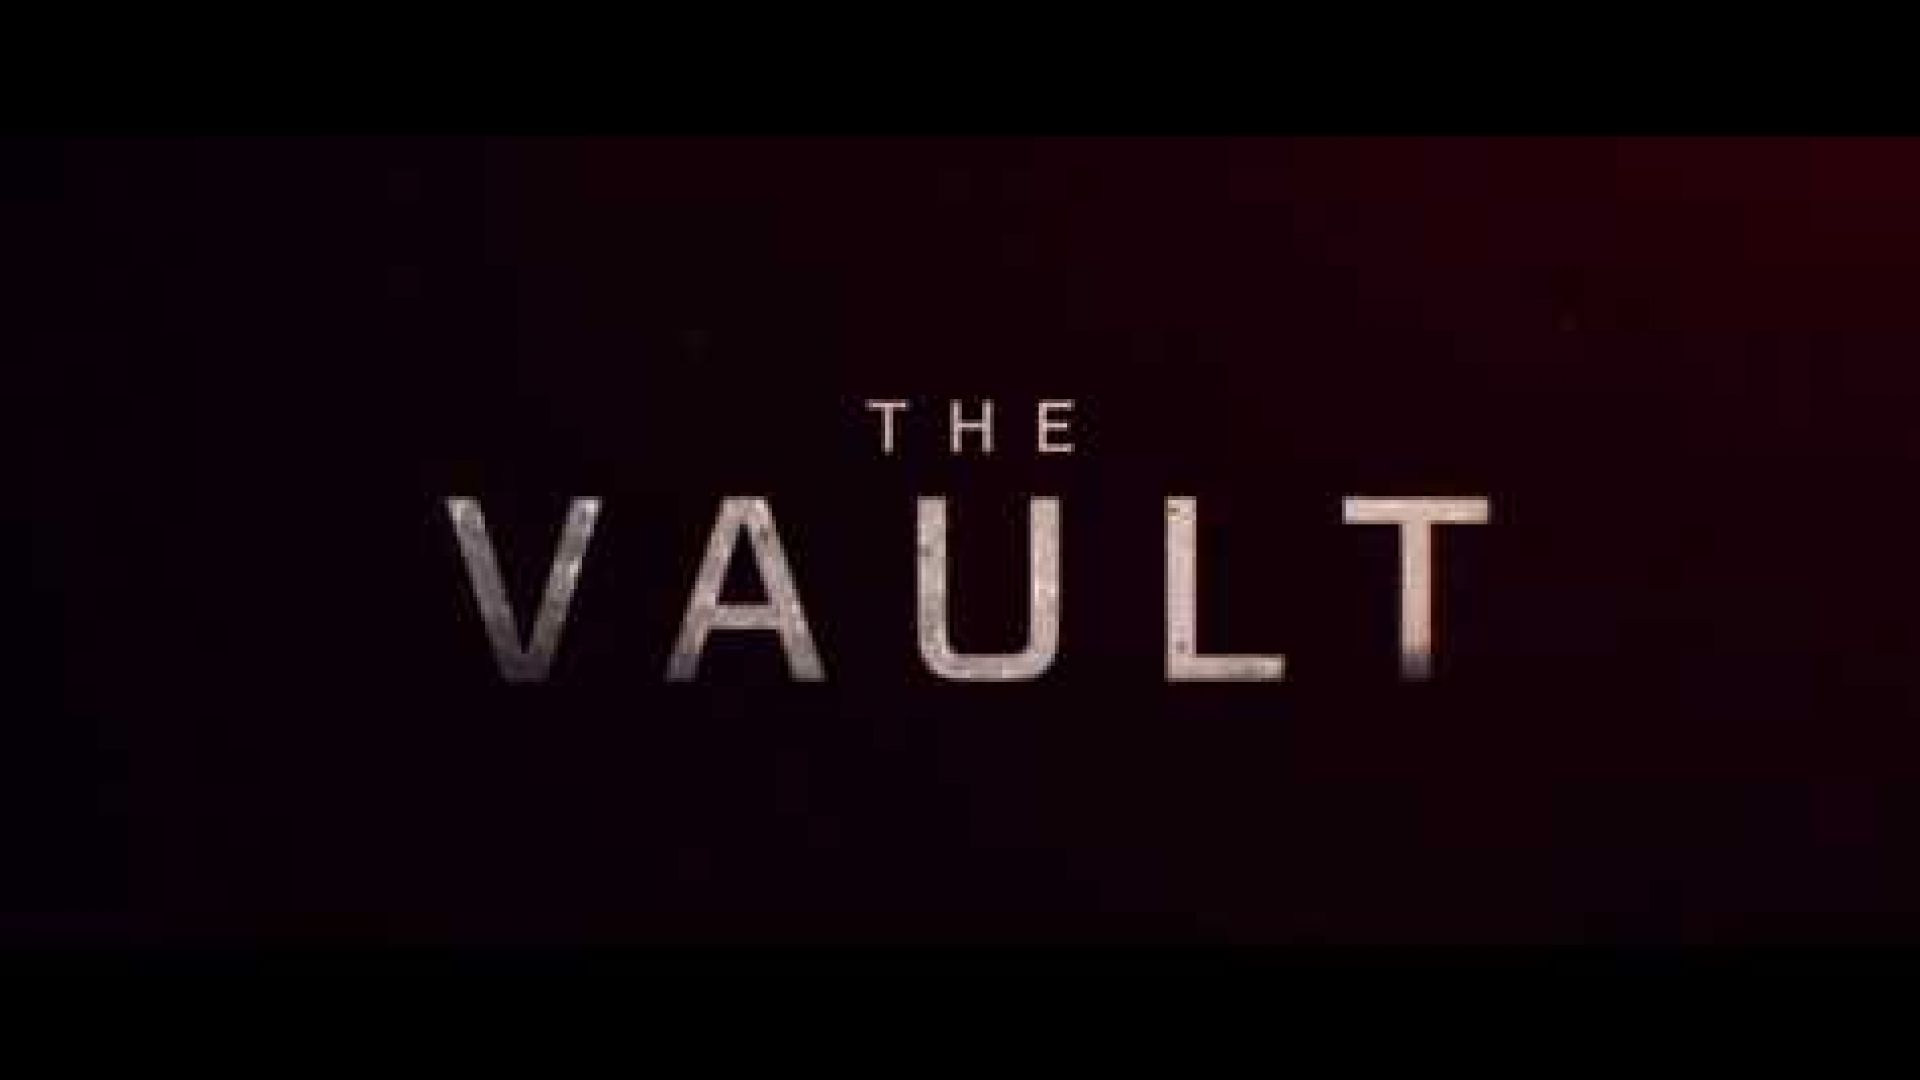 The Vault (2017) Trailer